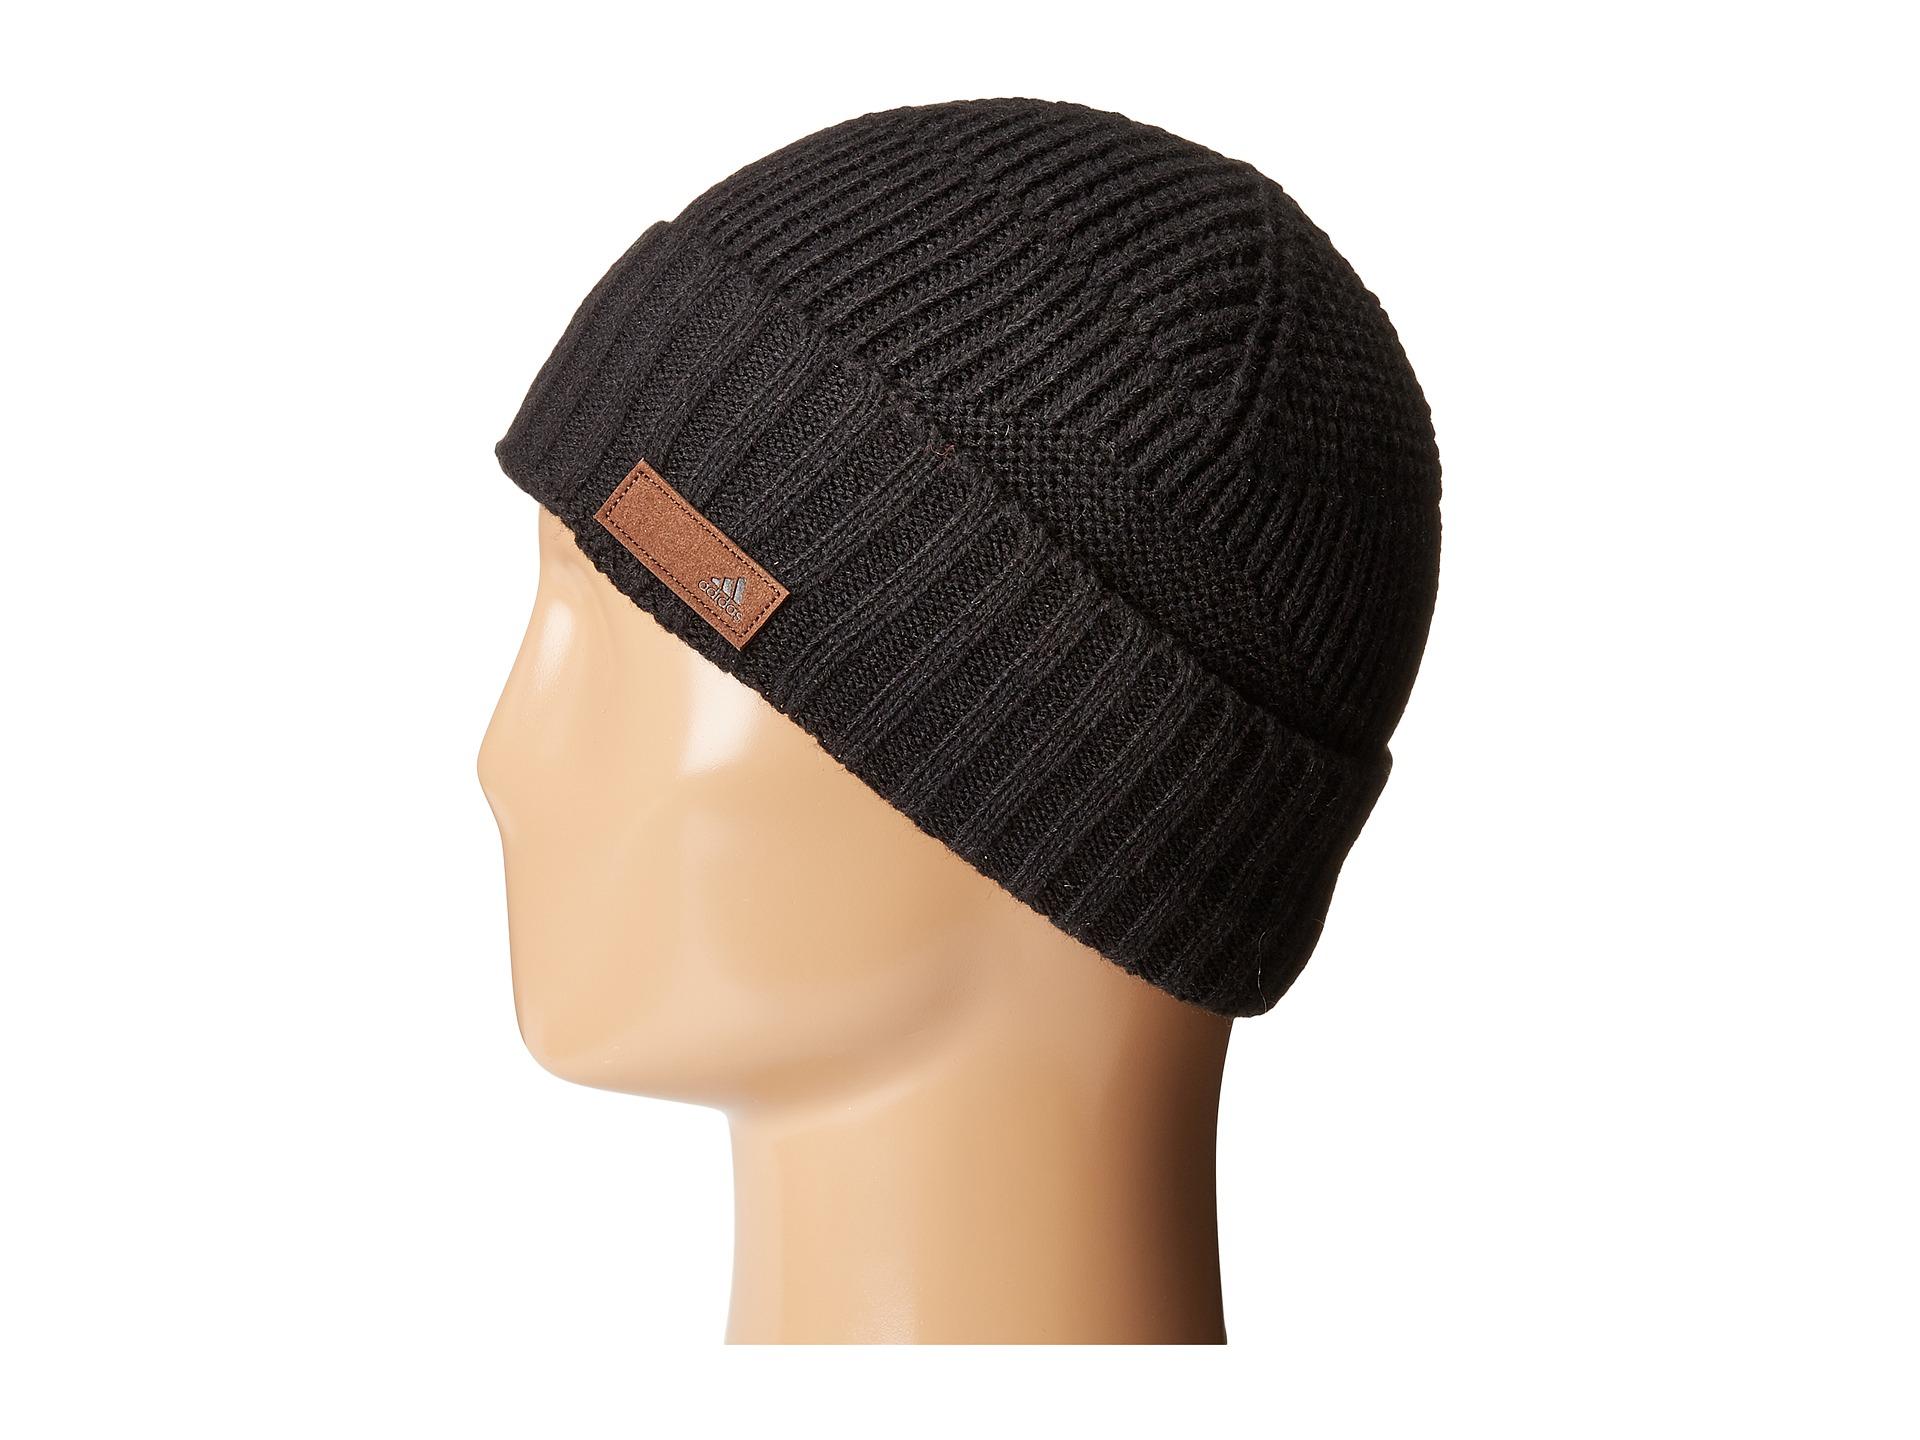 Lyst - adidas Originals Pine Knot Beanie in Black for Men 0c8607923fc